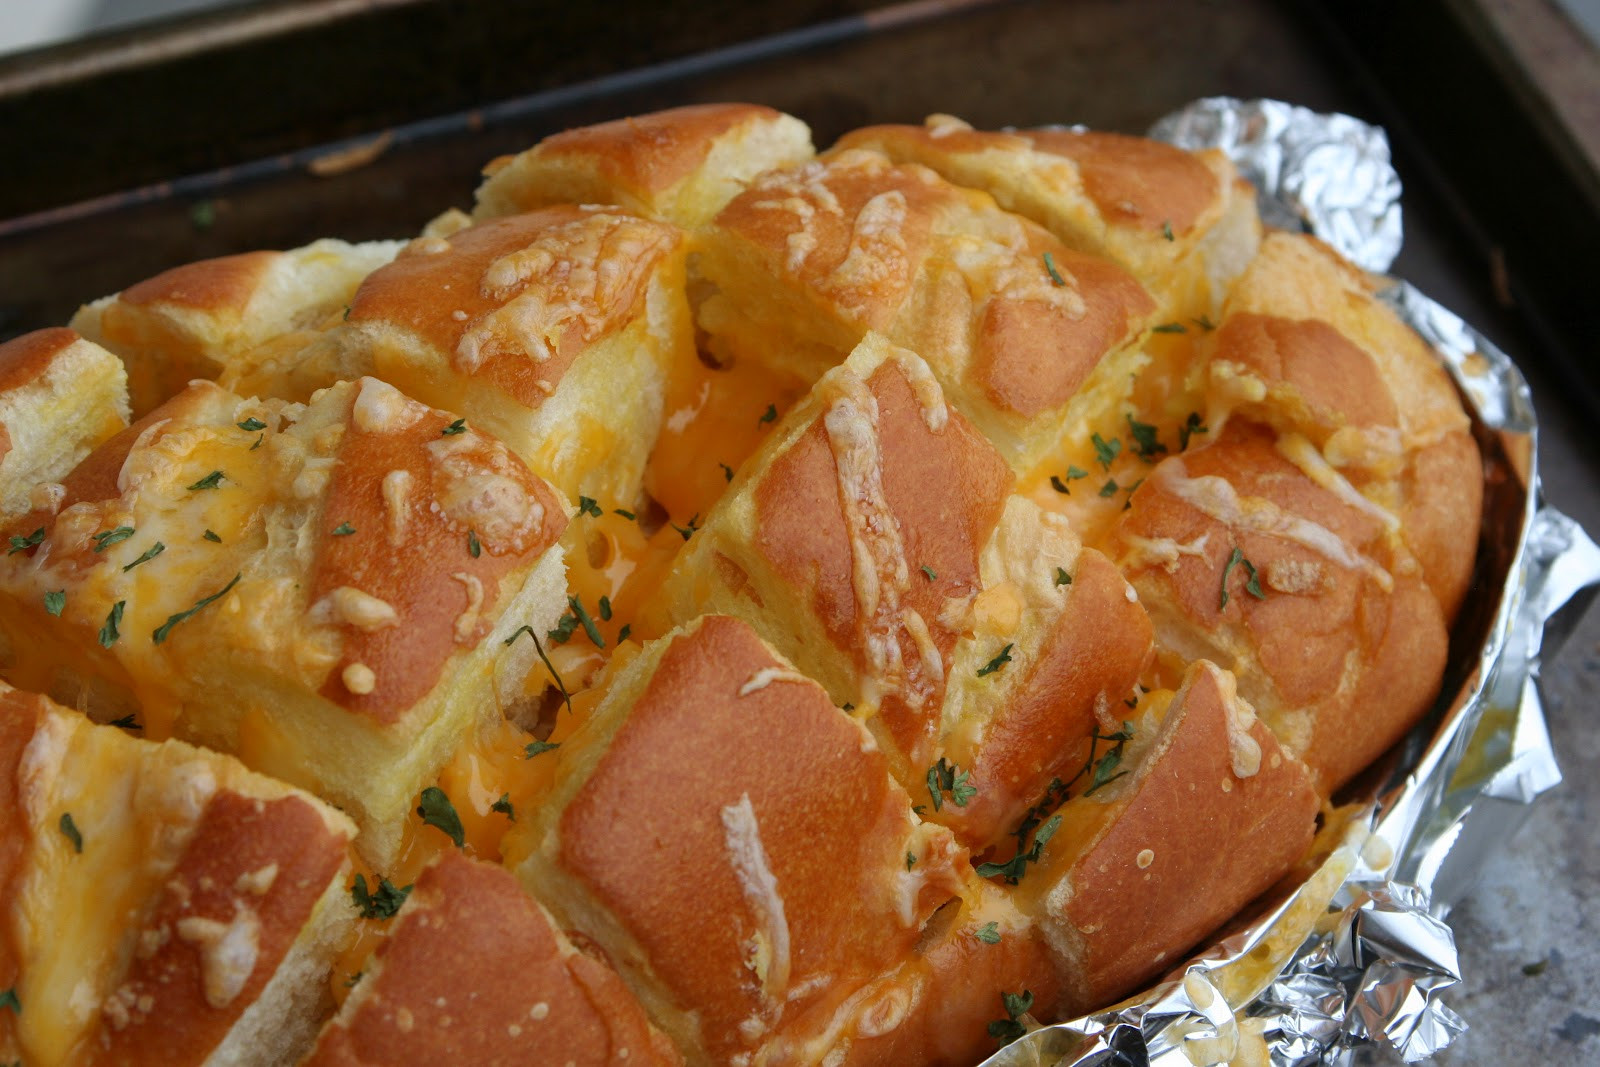 Stuffed Bread Recipes  Recipe Shoebox Stuffed French Bread